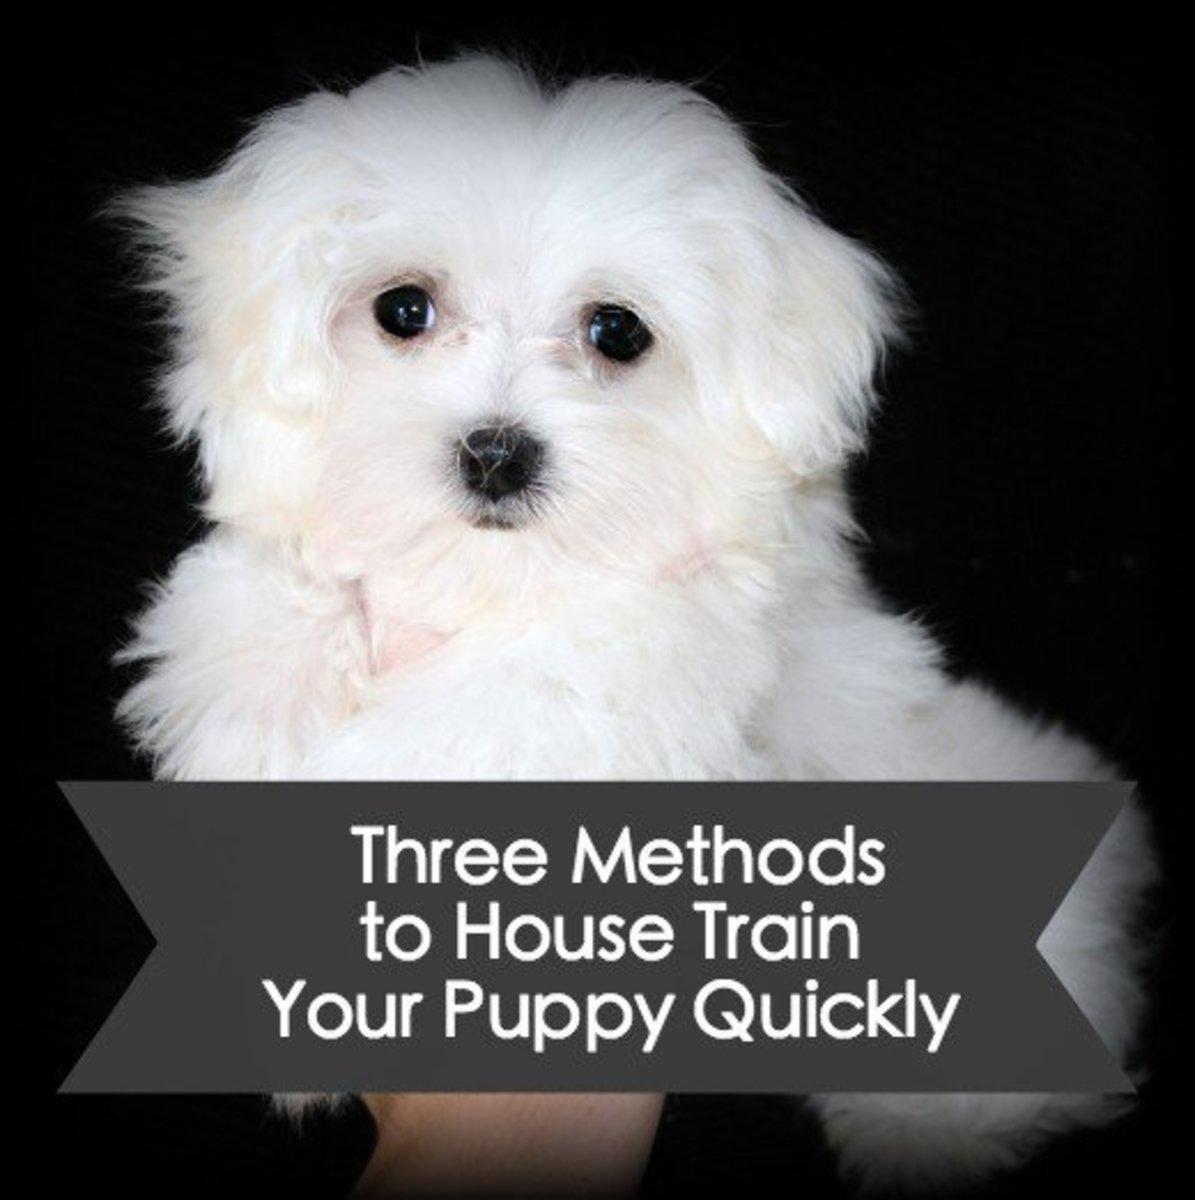 Potty Train Your Dog Fast